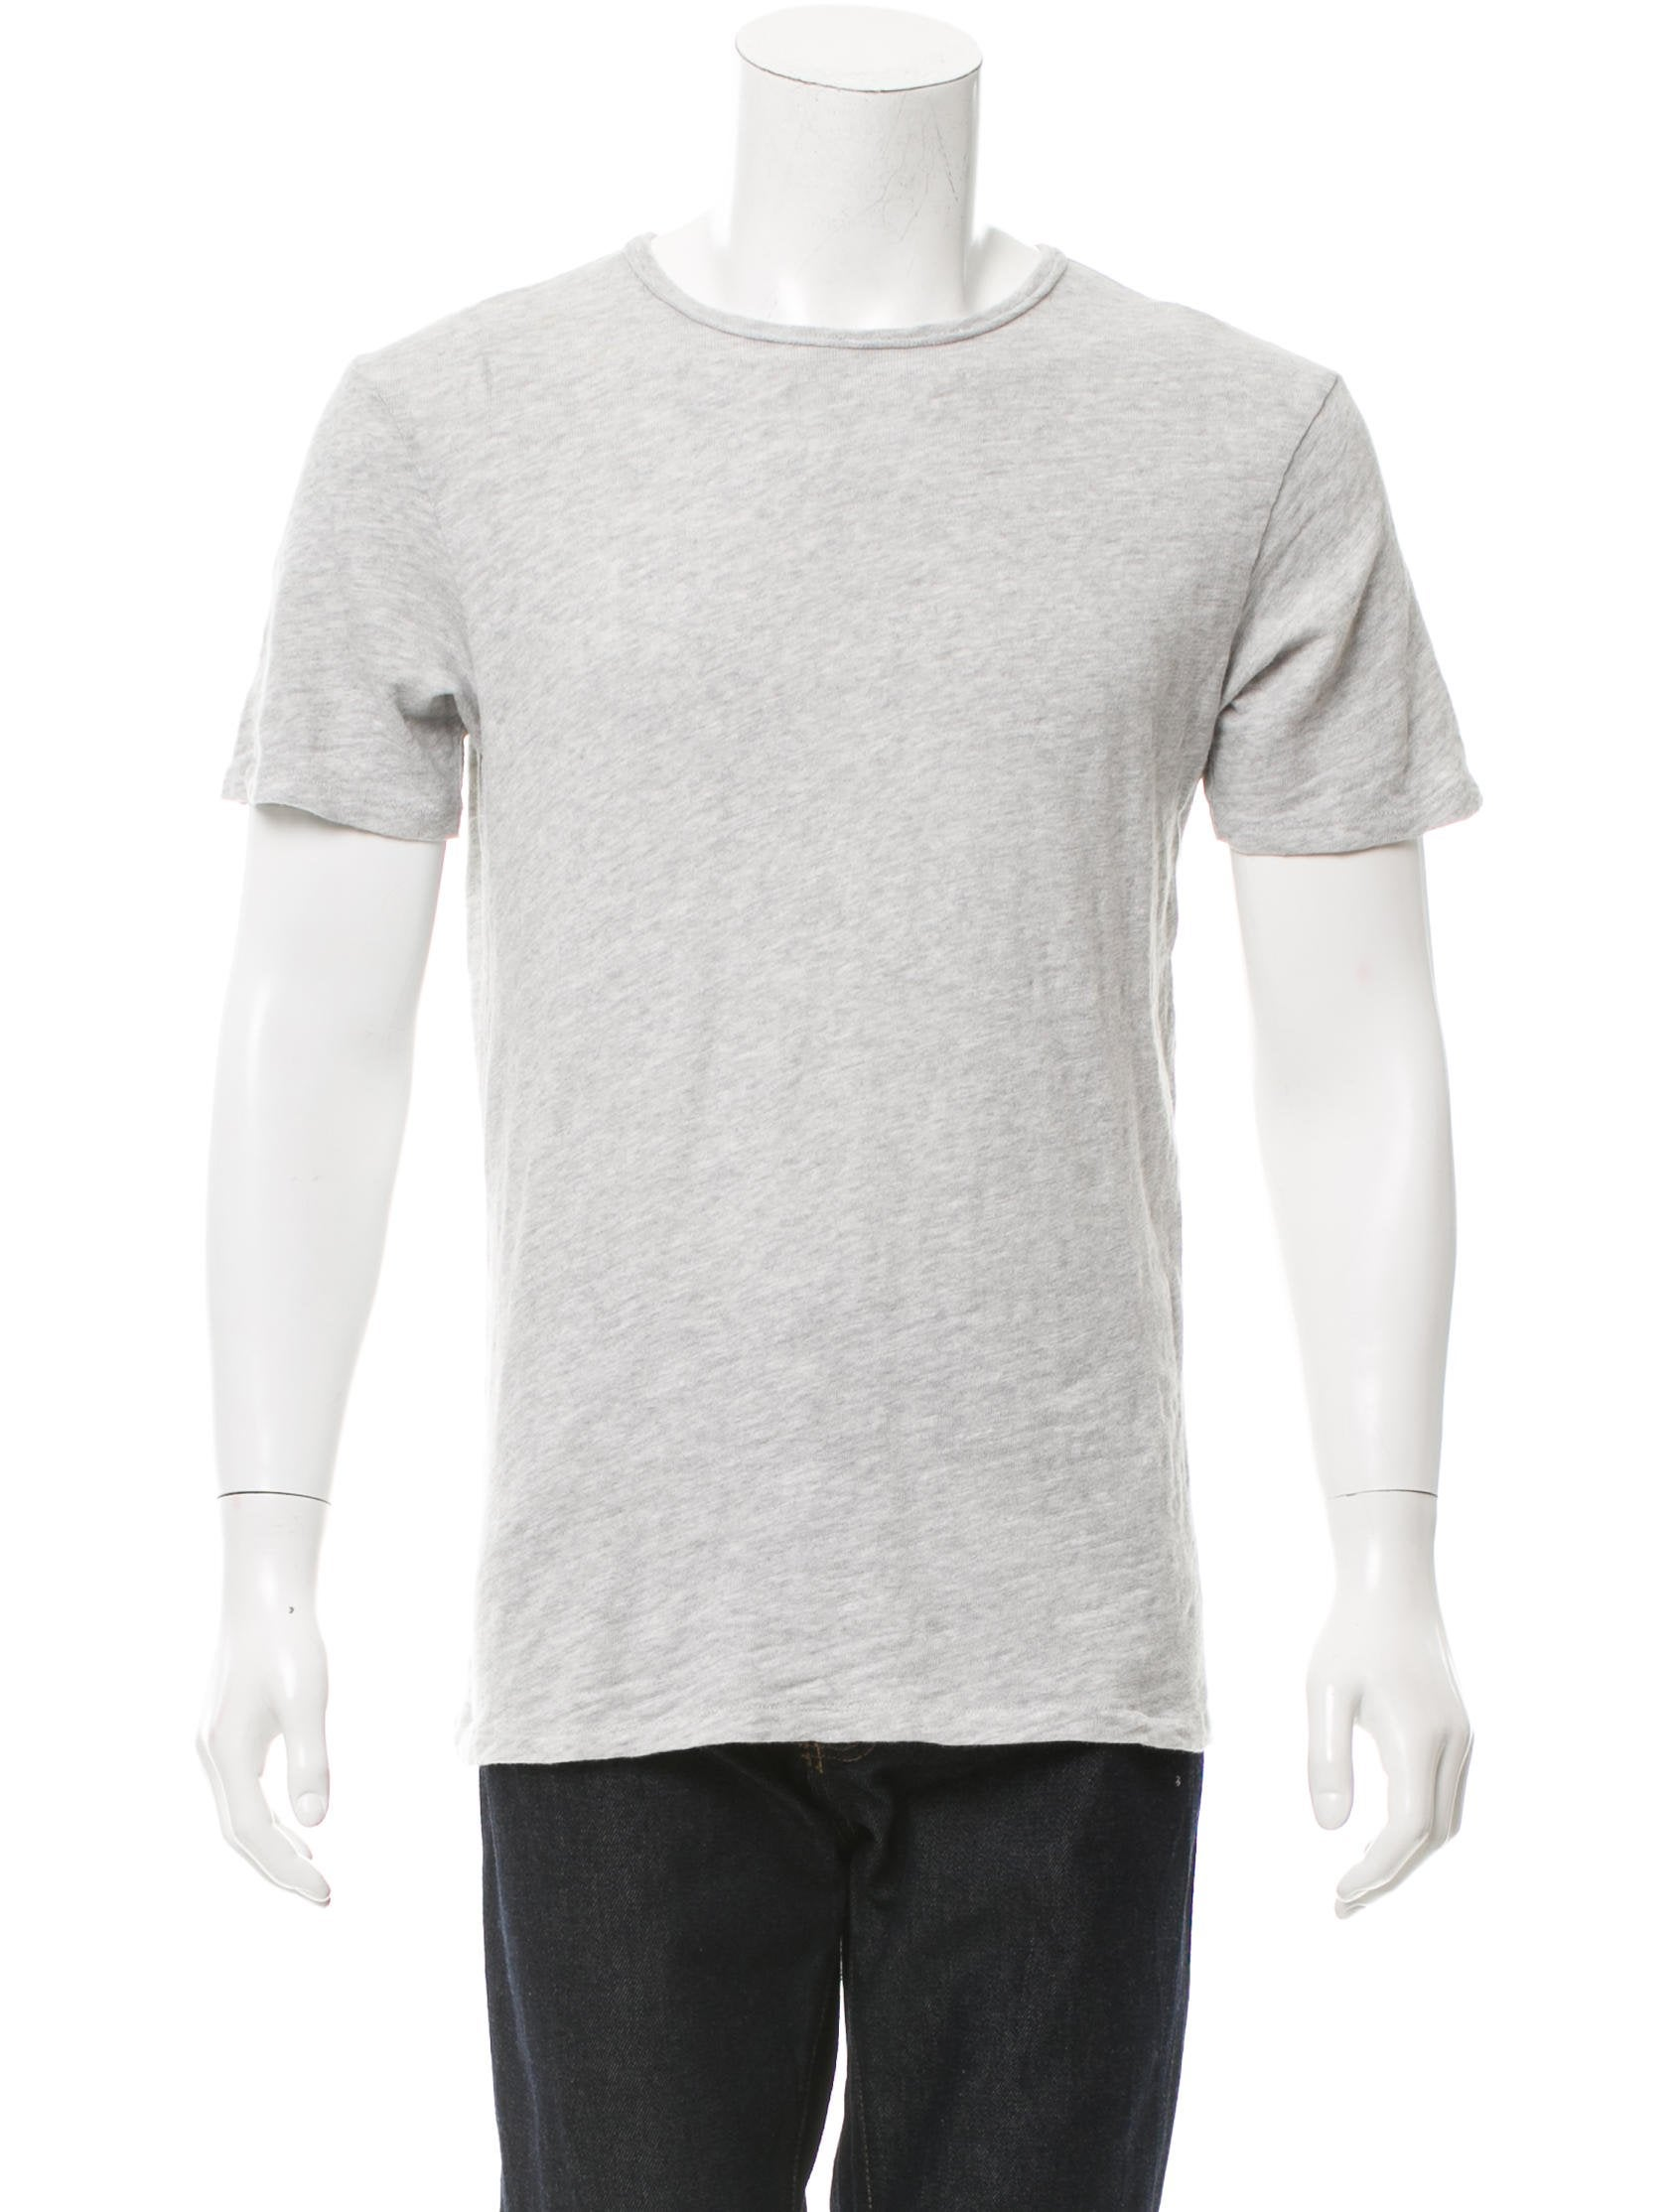 Rag bone short sleeve bateau neck t shirt clothing for Rag and bone t shirts